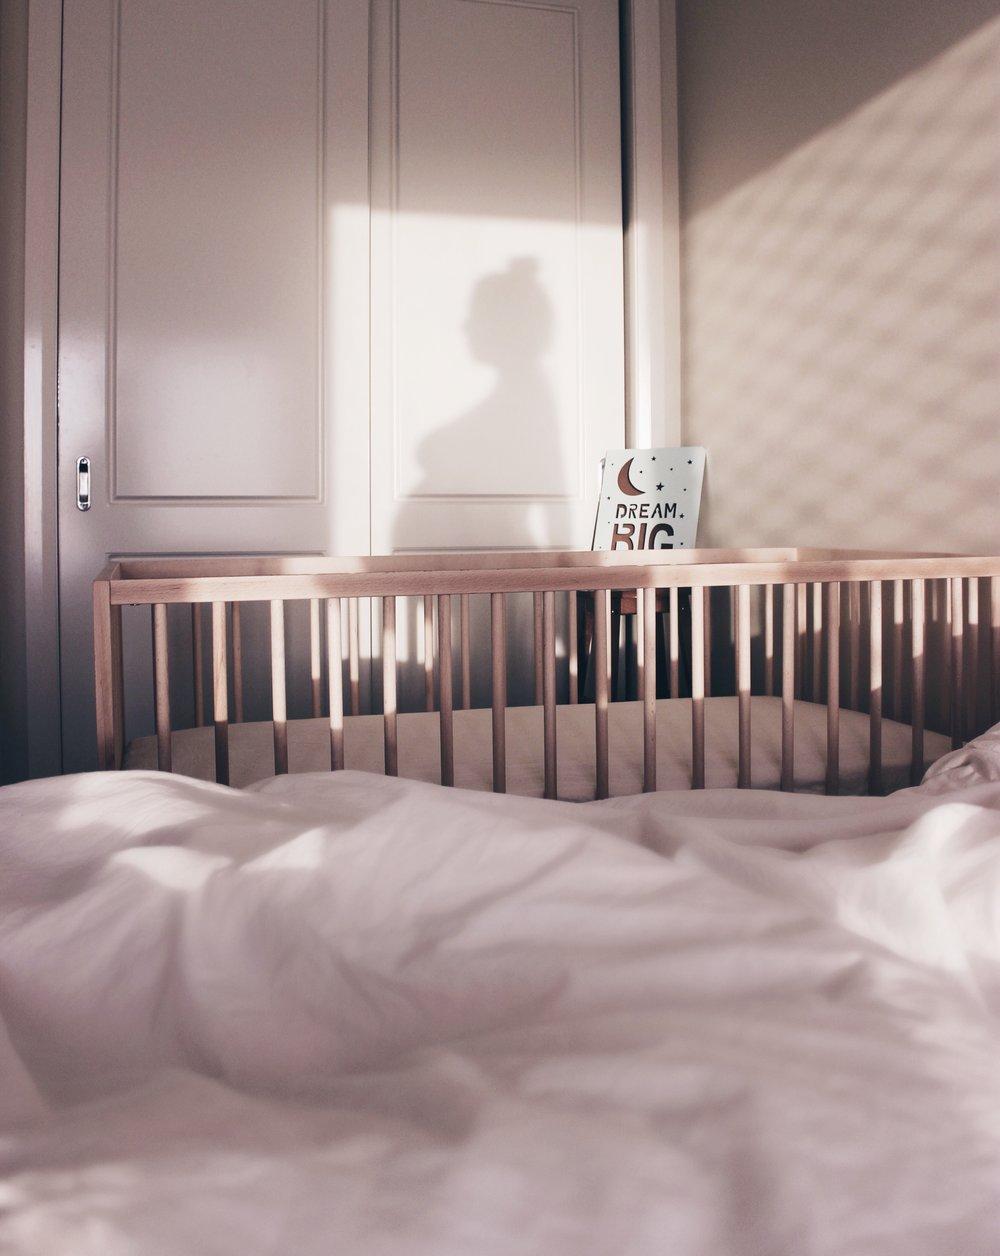 ettitude-dream-big-bassinet